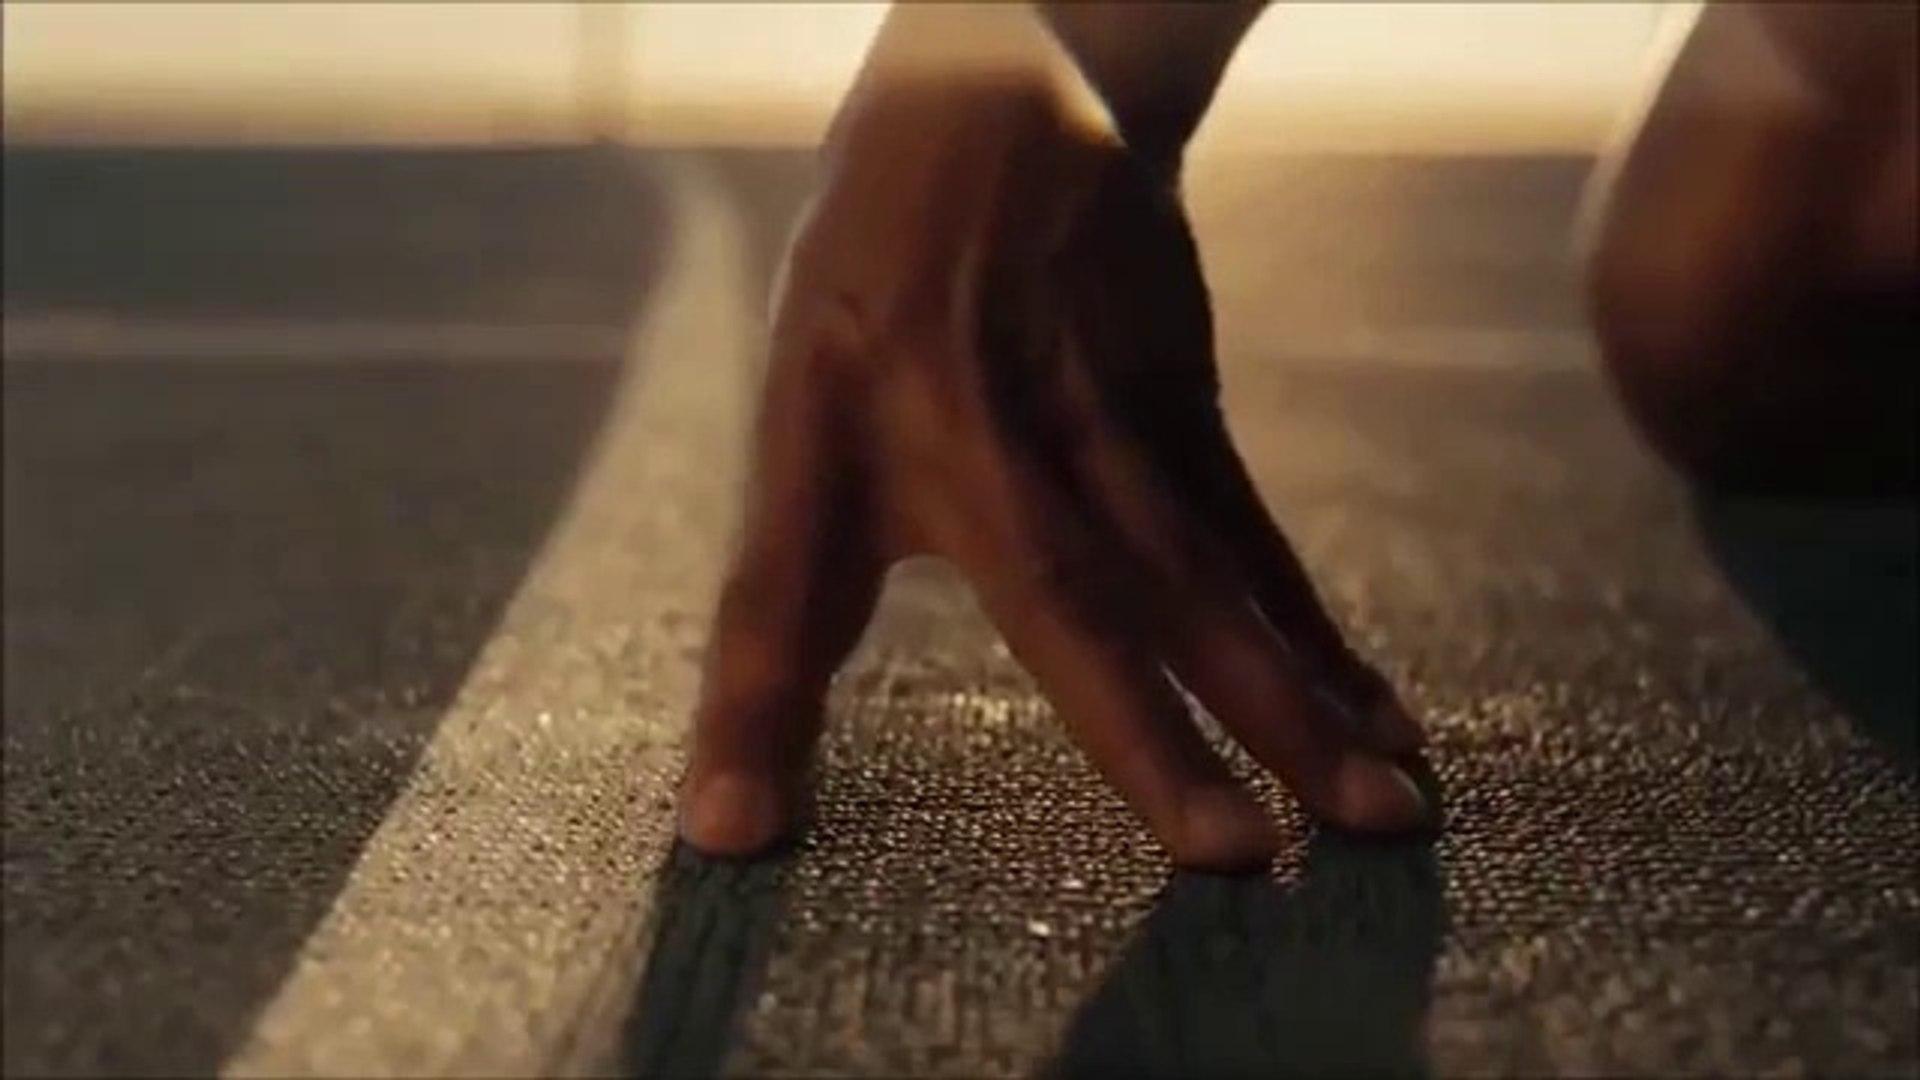 Greatness awaits - Motivational Video